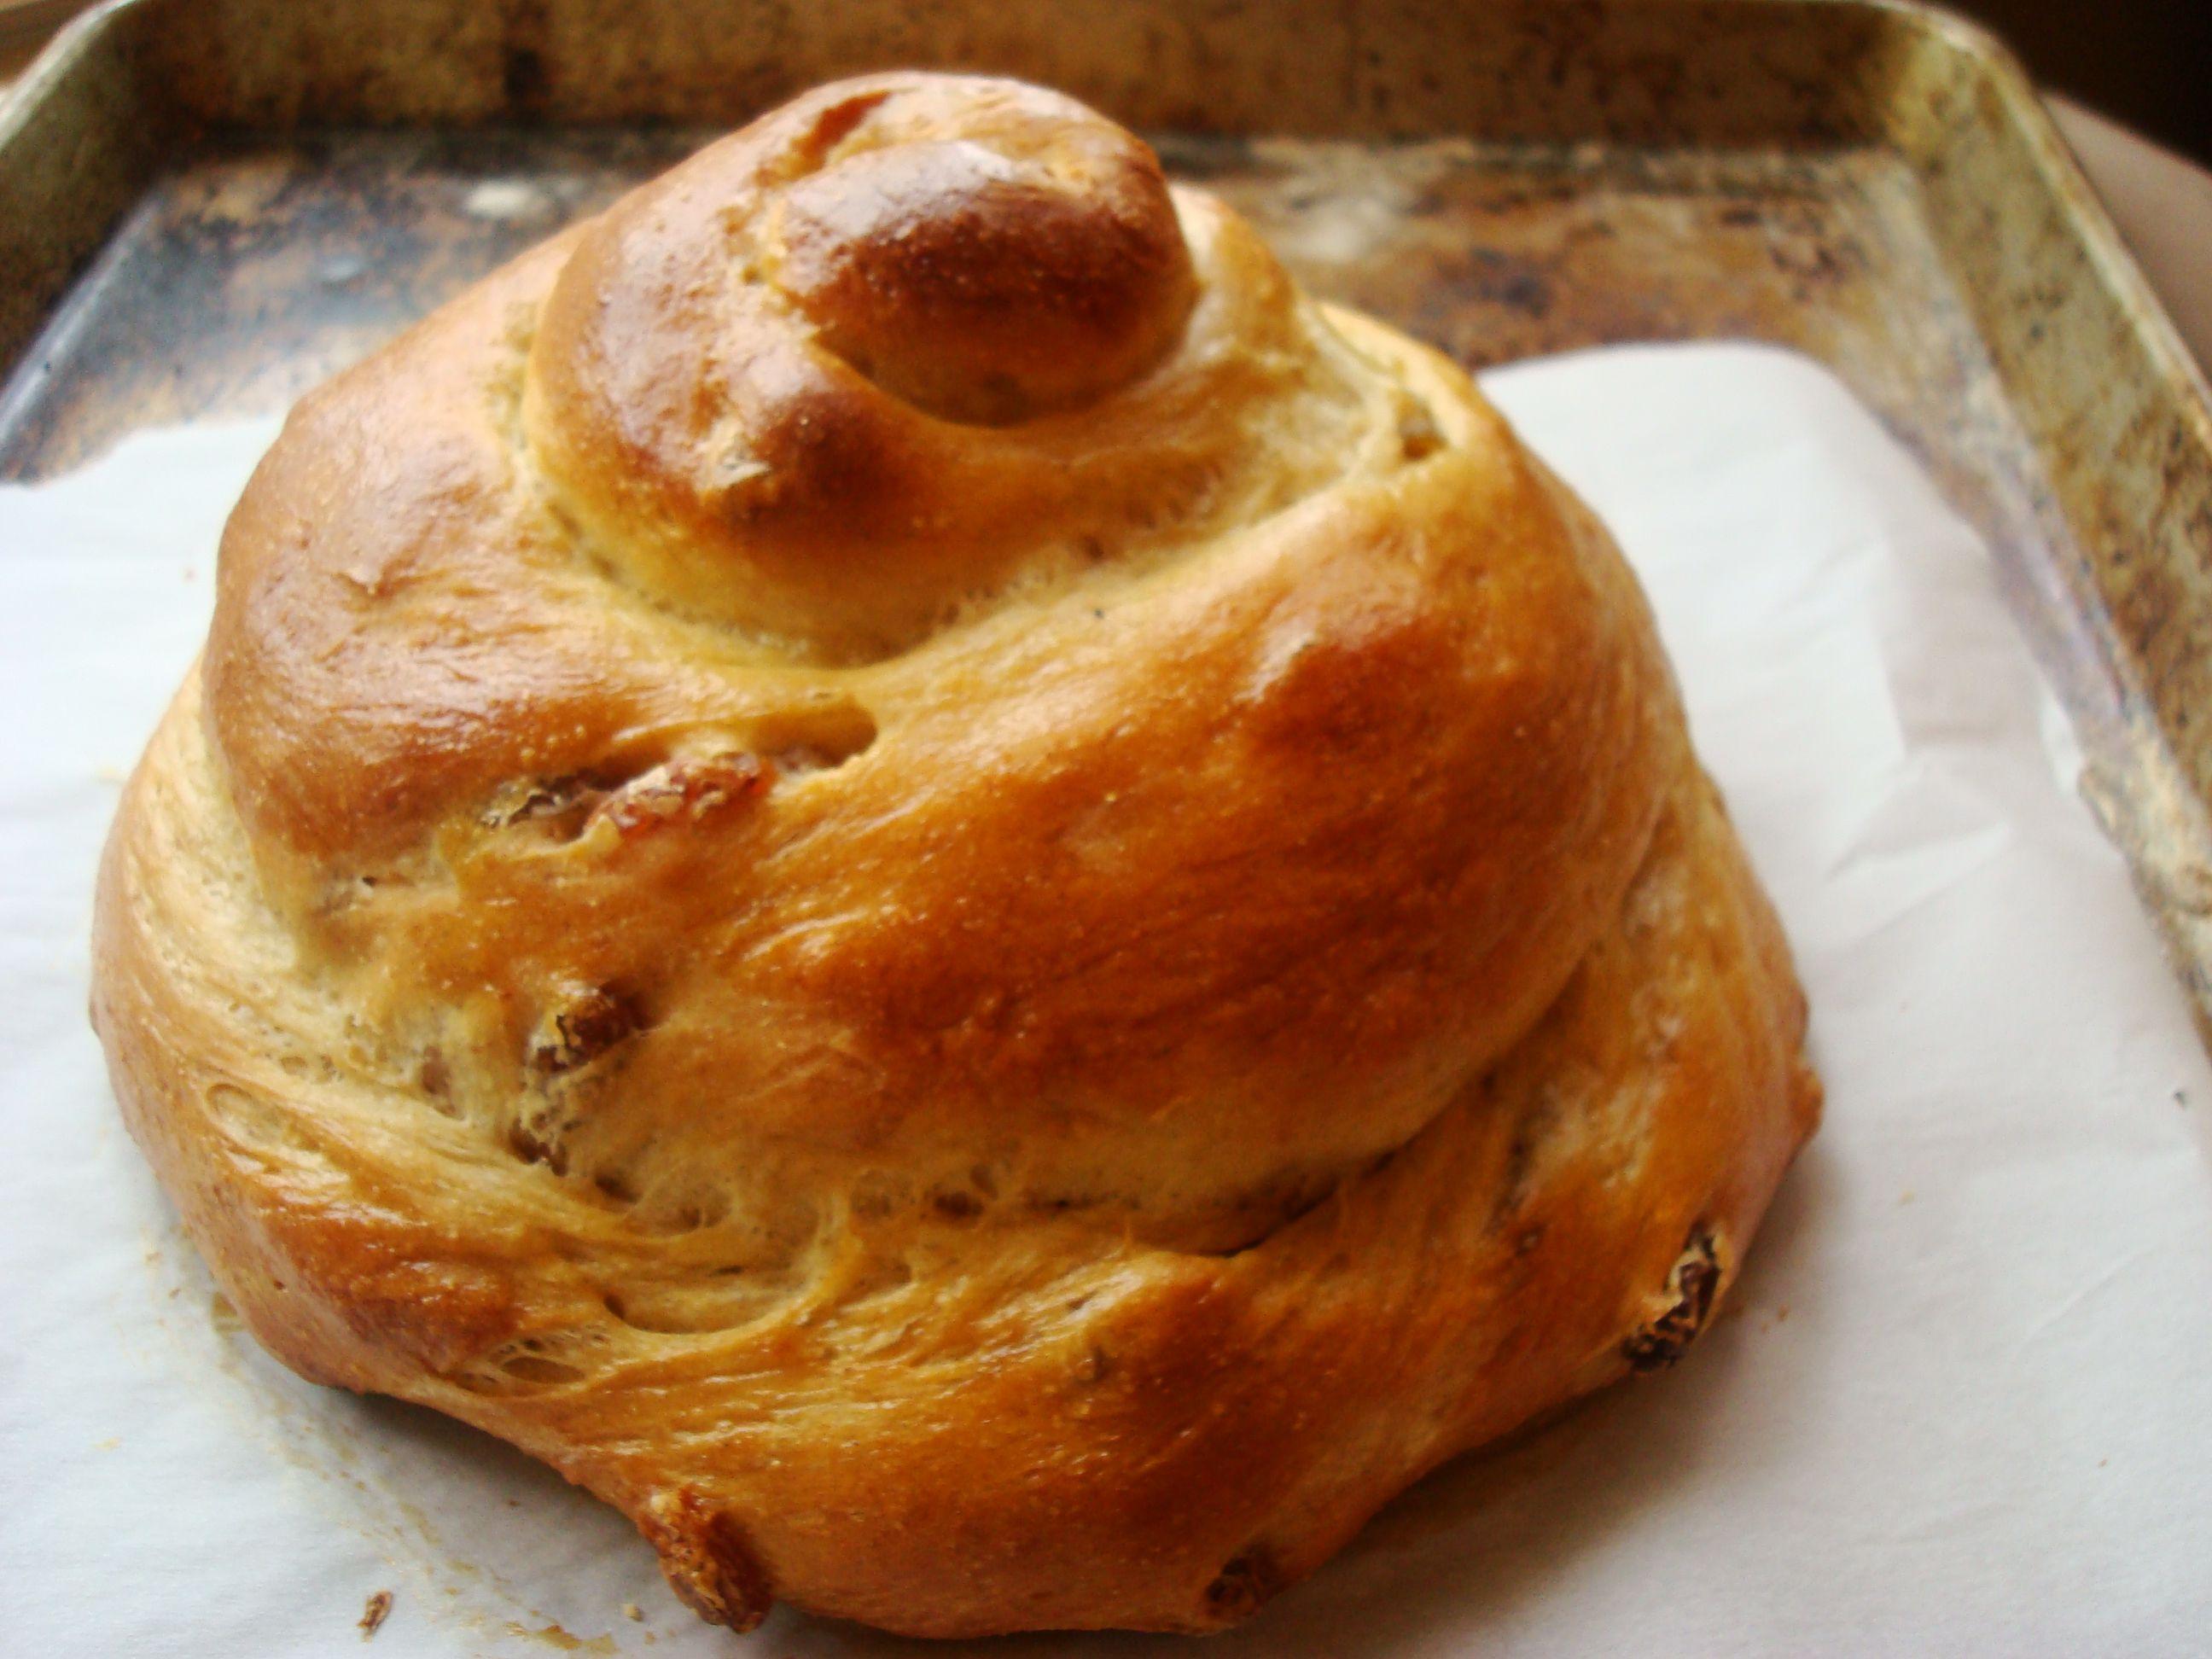 10 symbolic foods for rosh hashanah rosh hashanah food customs and menus biocorpaavc